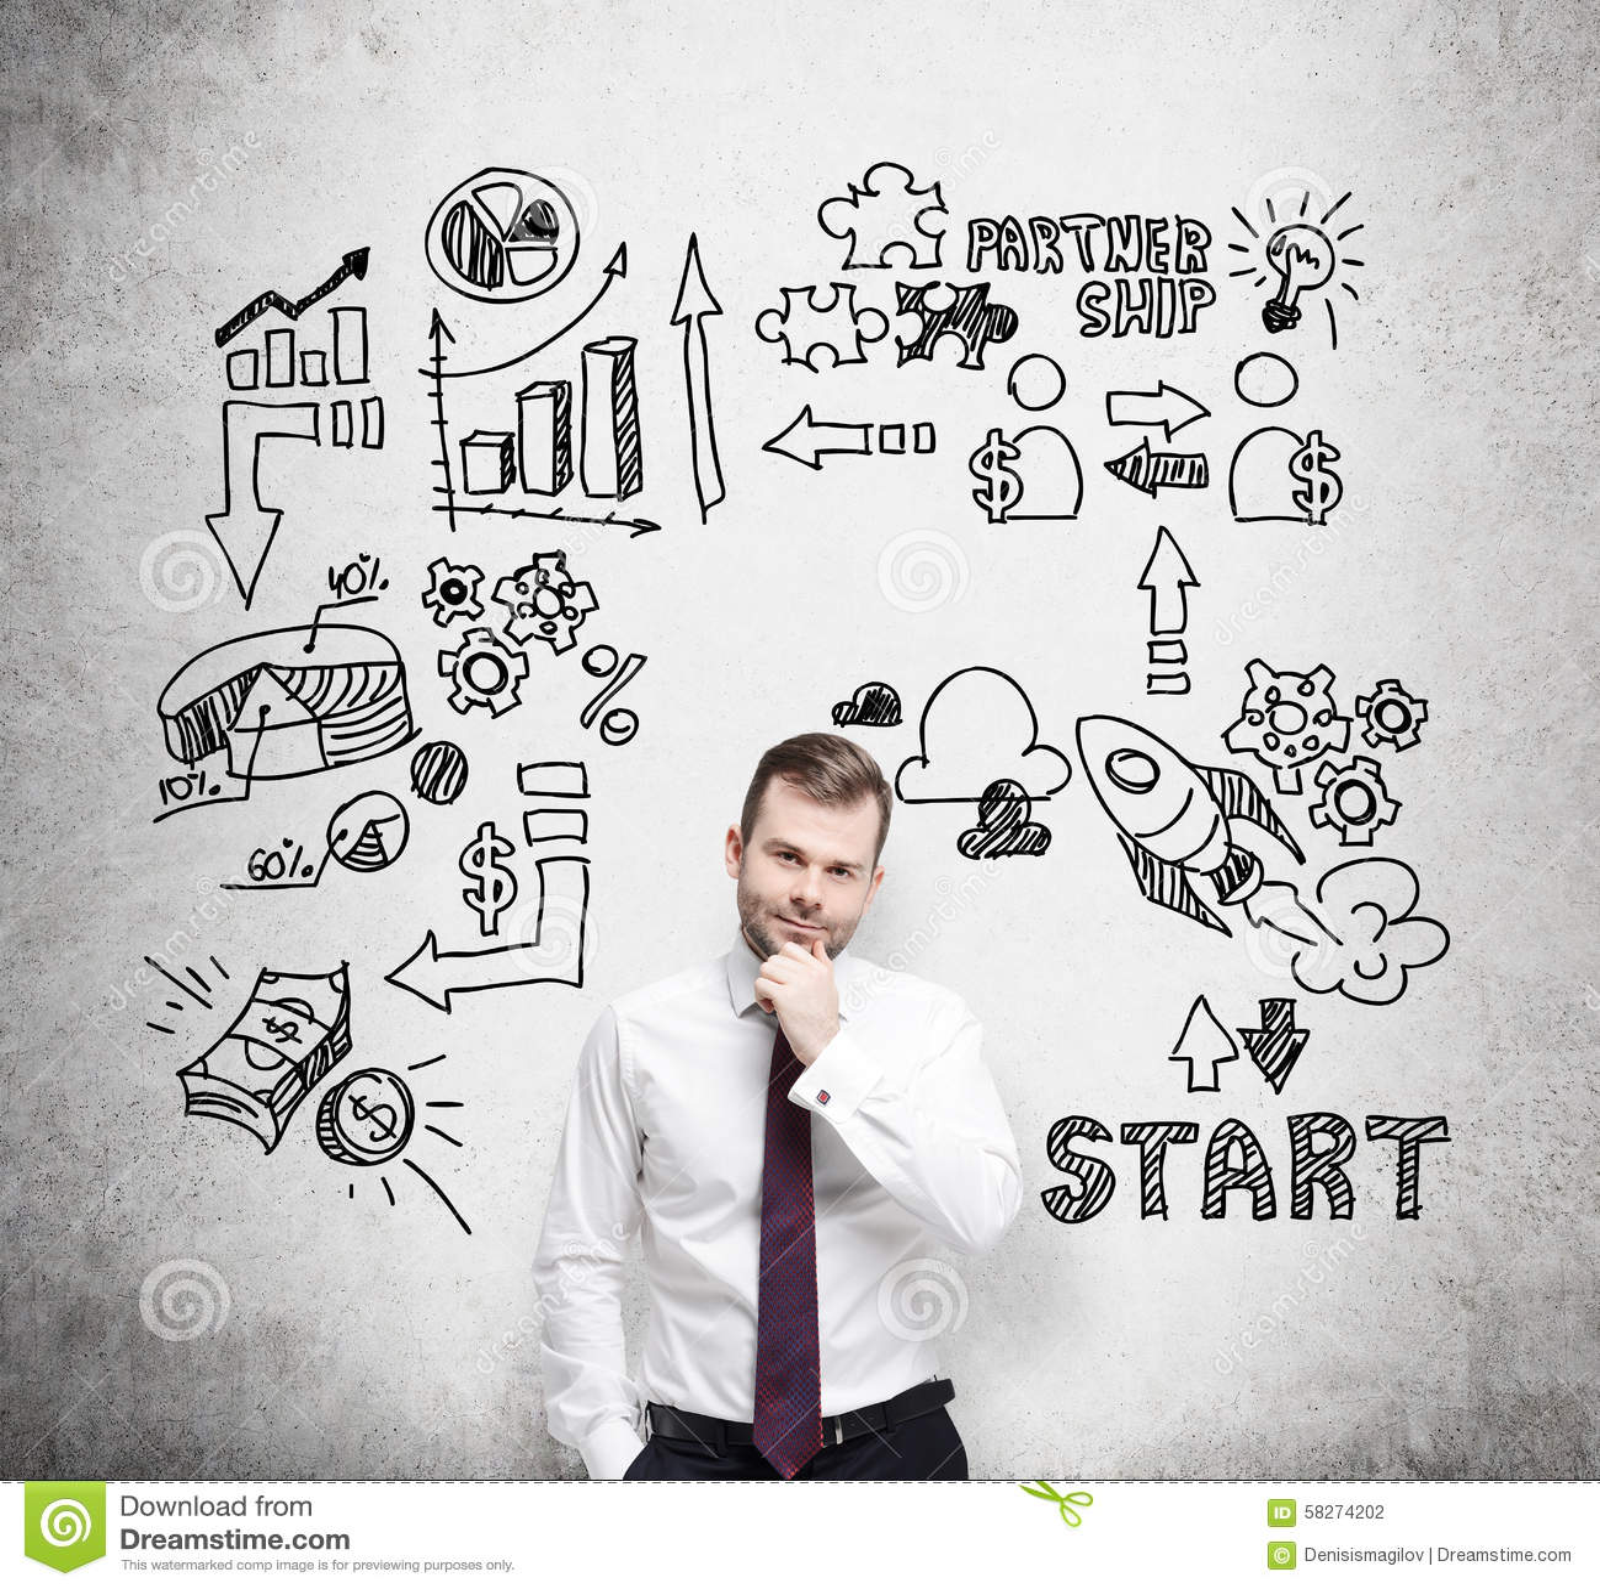 Start planning for success!